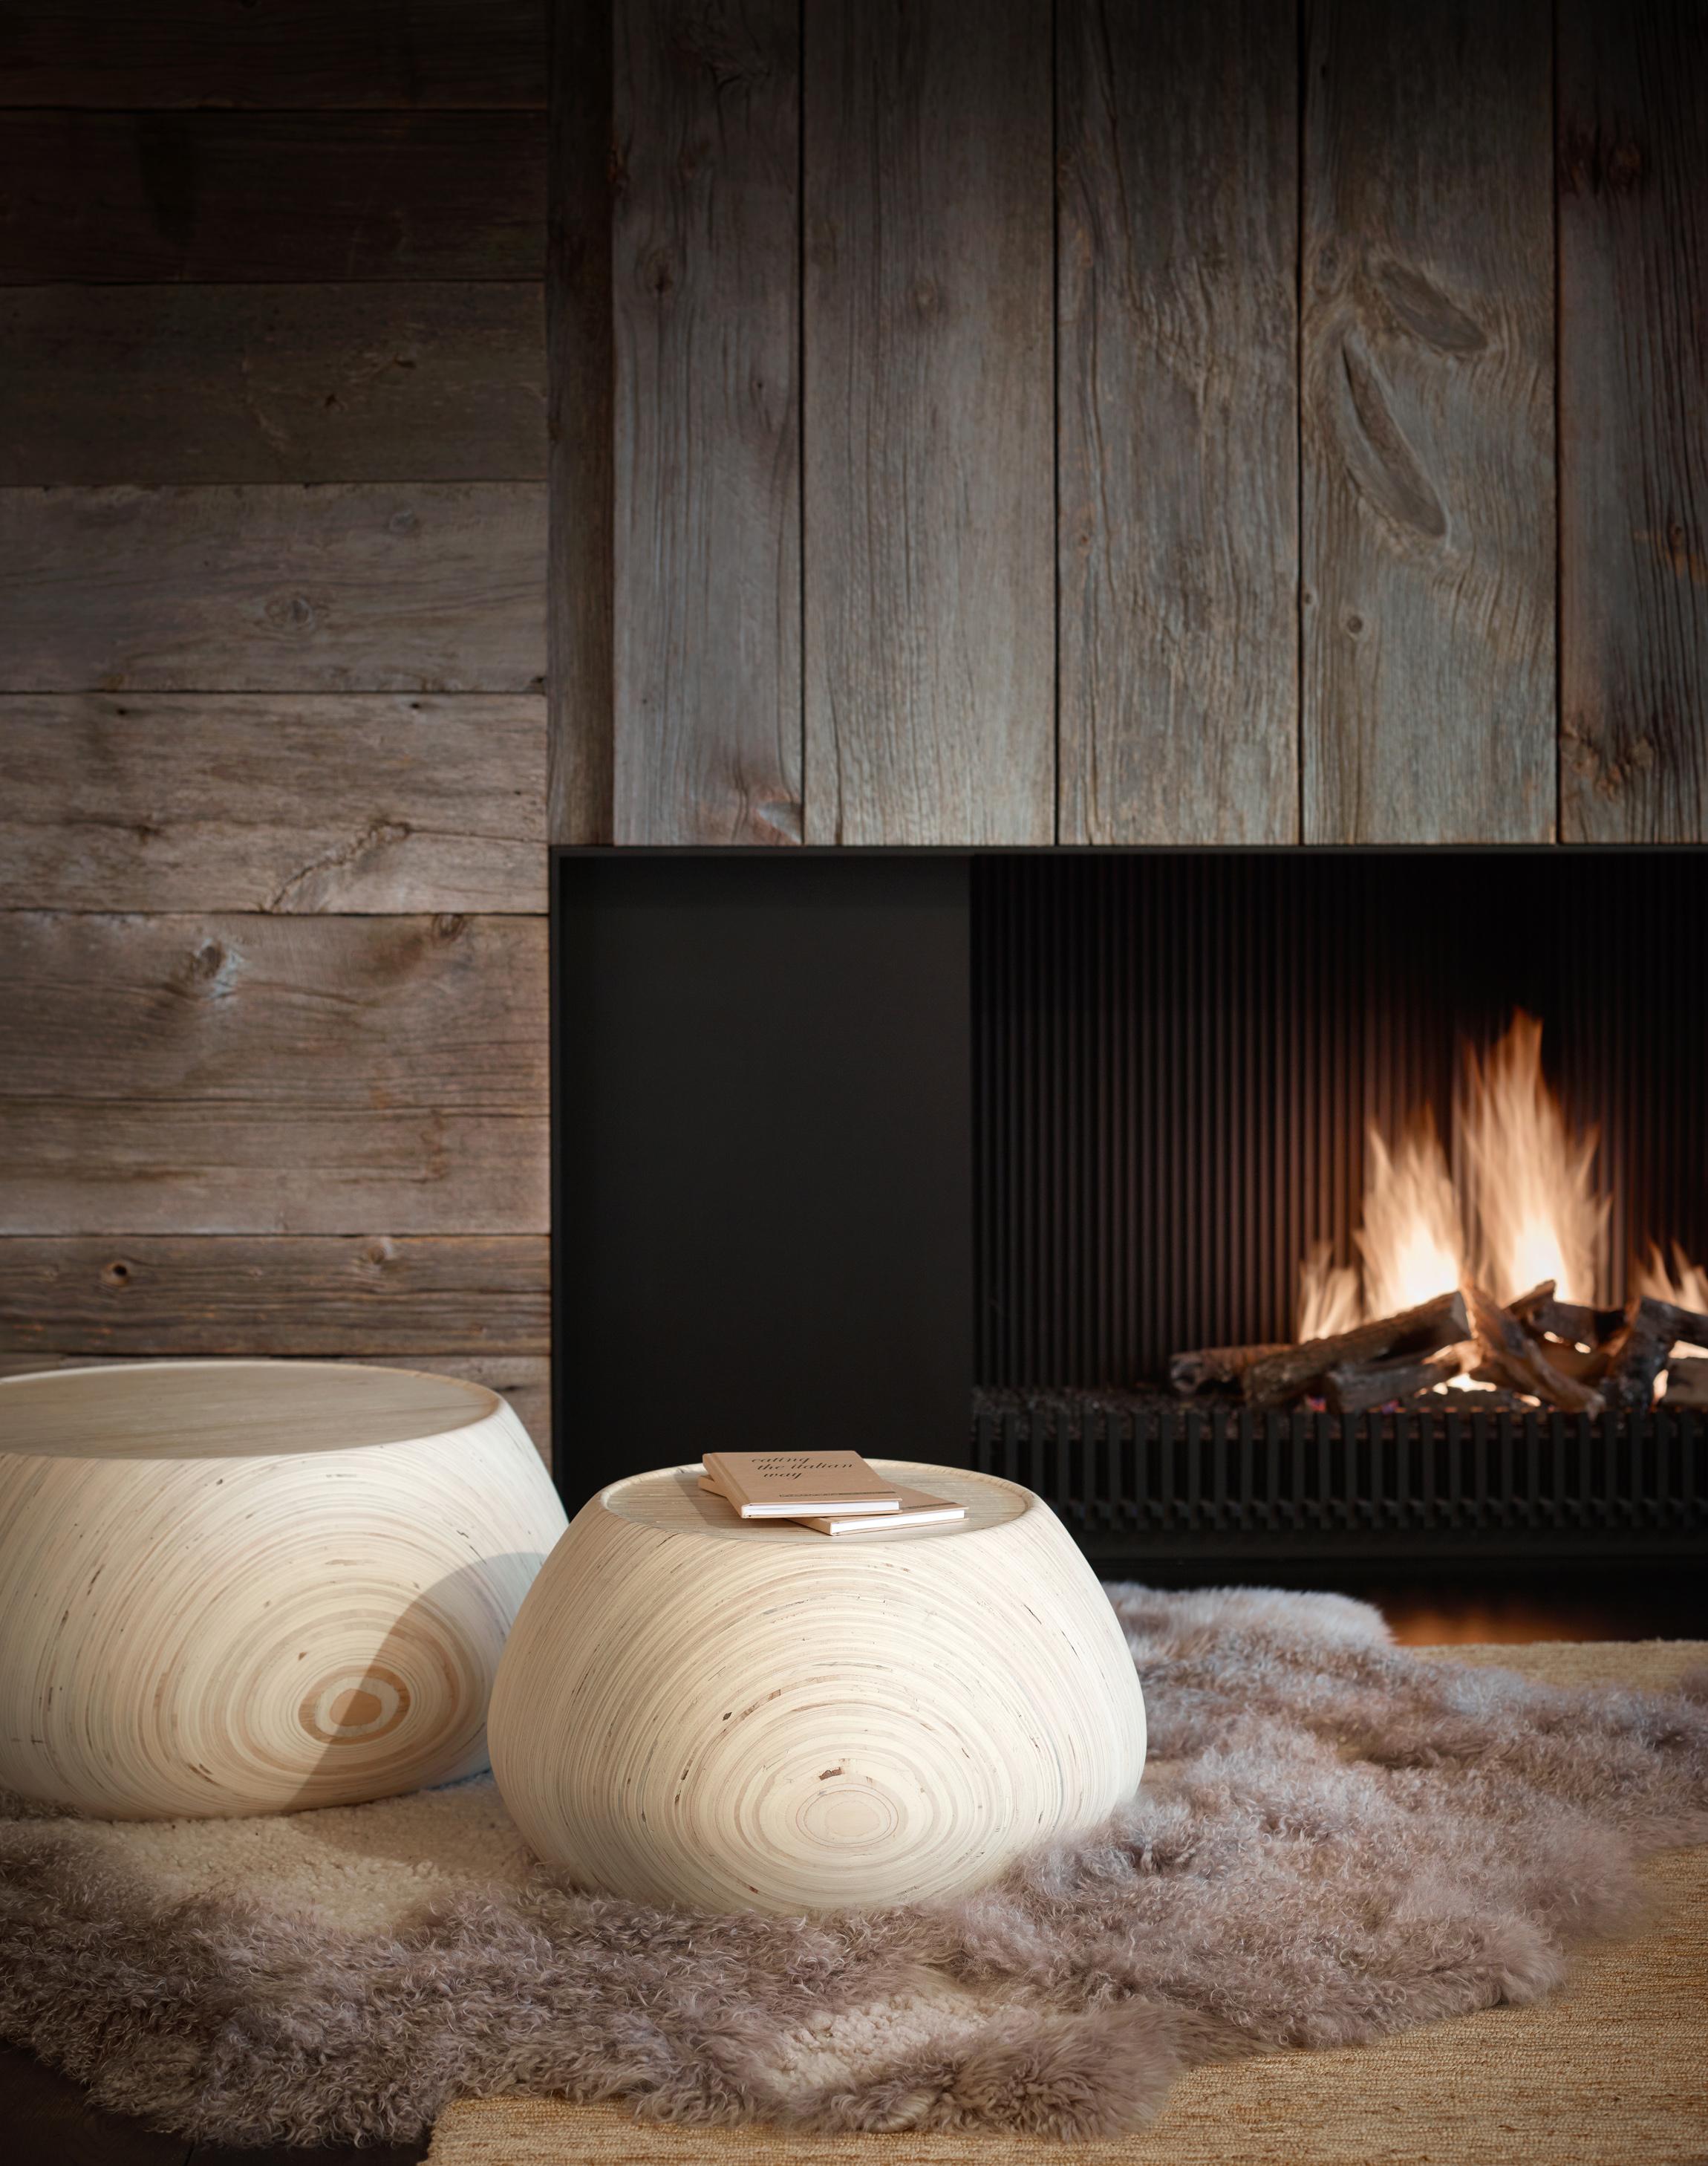 Wildspirit Motley Solid wood tables